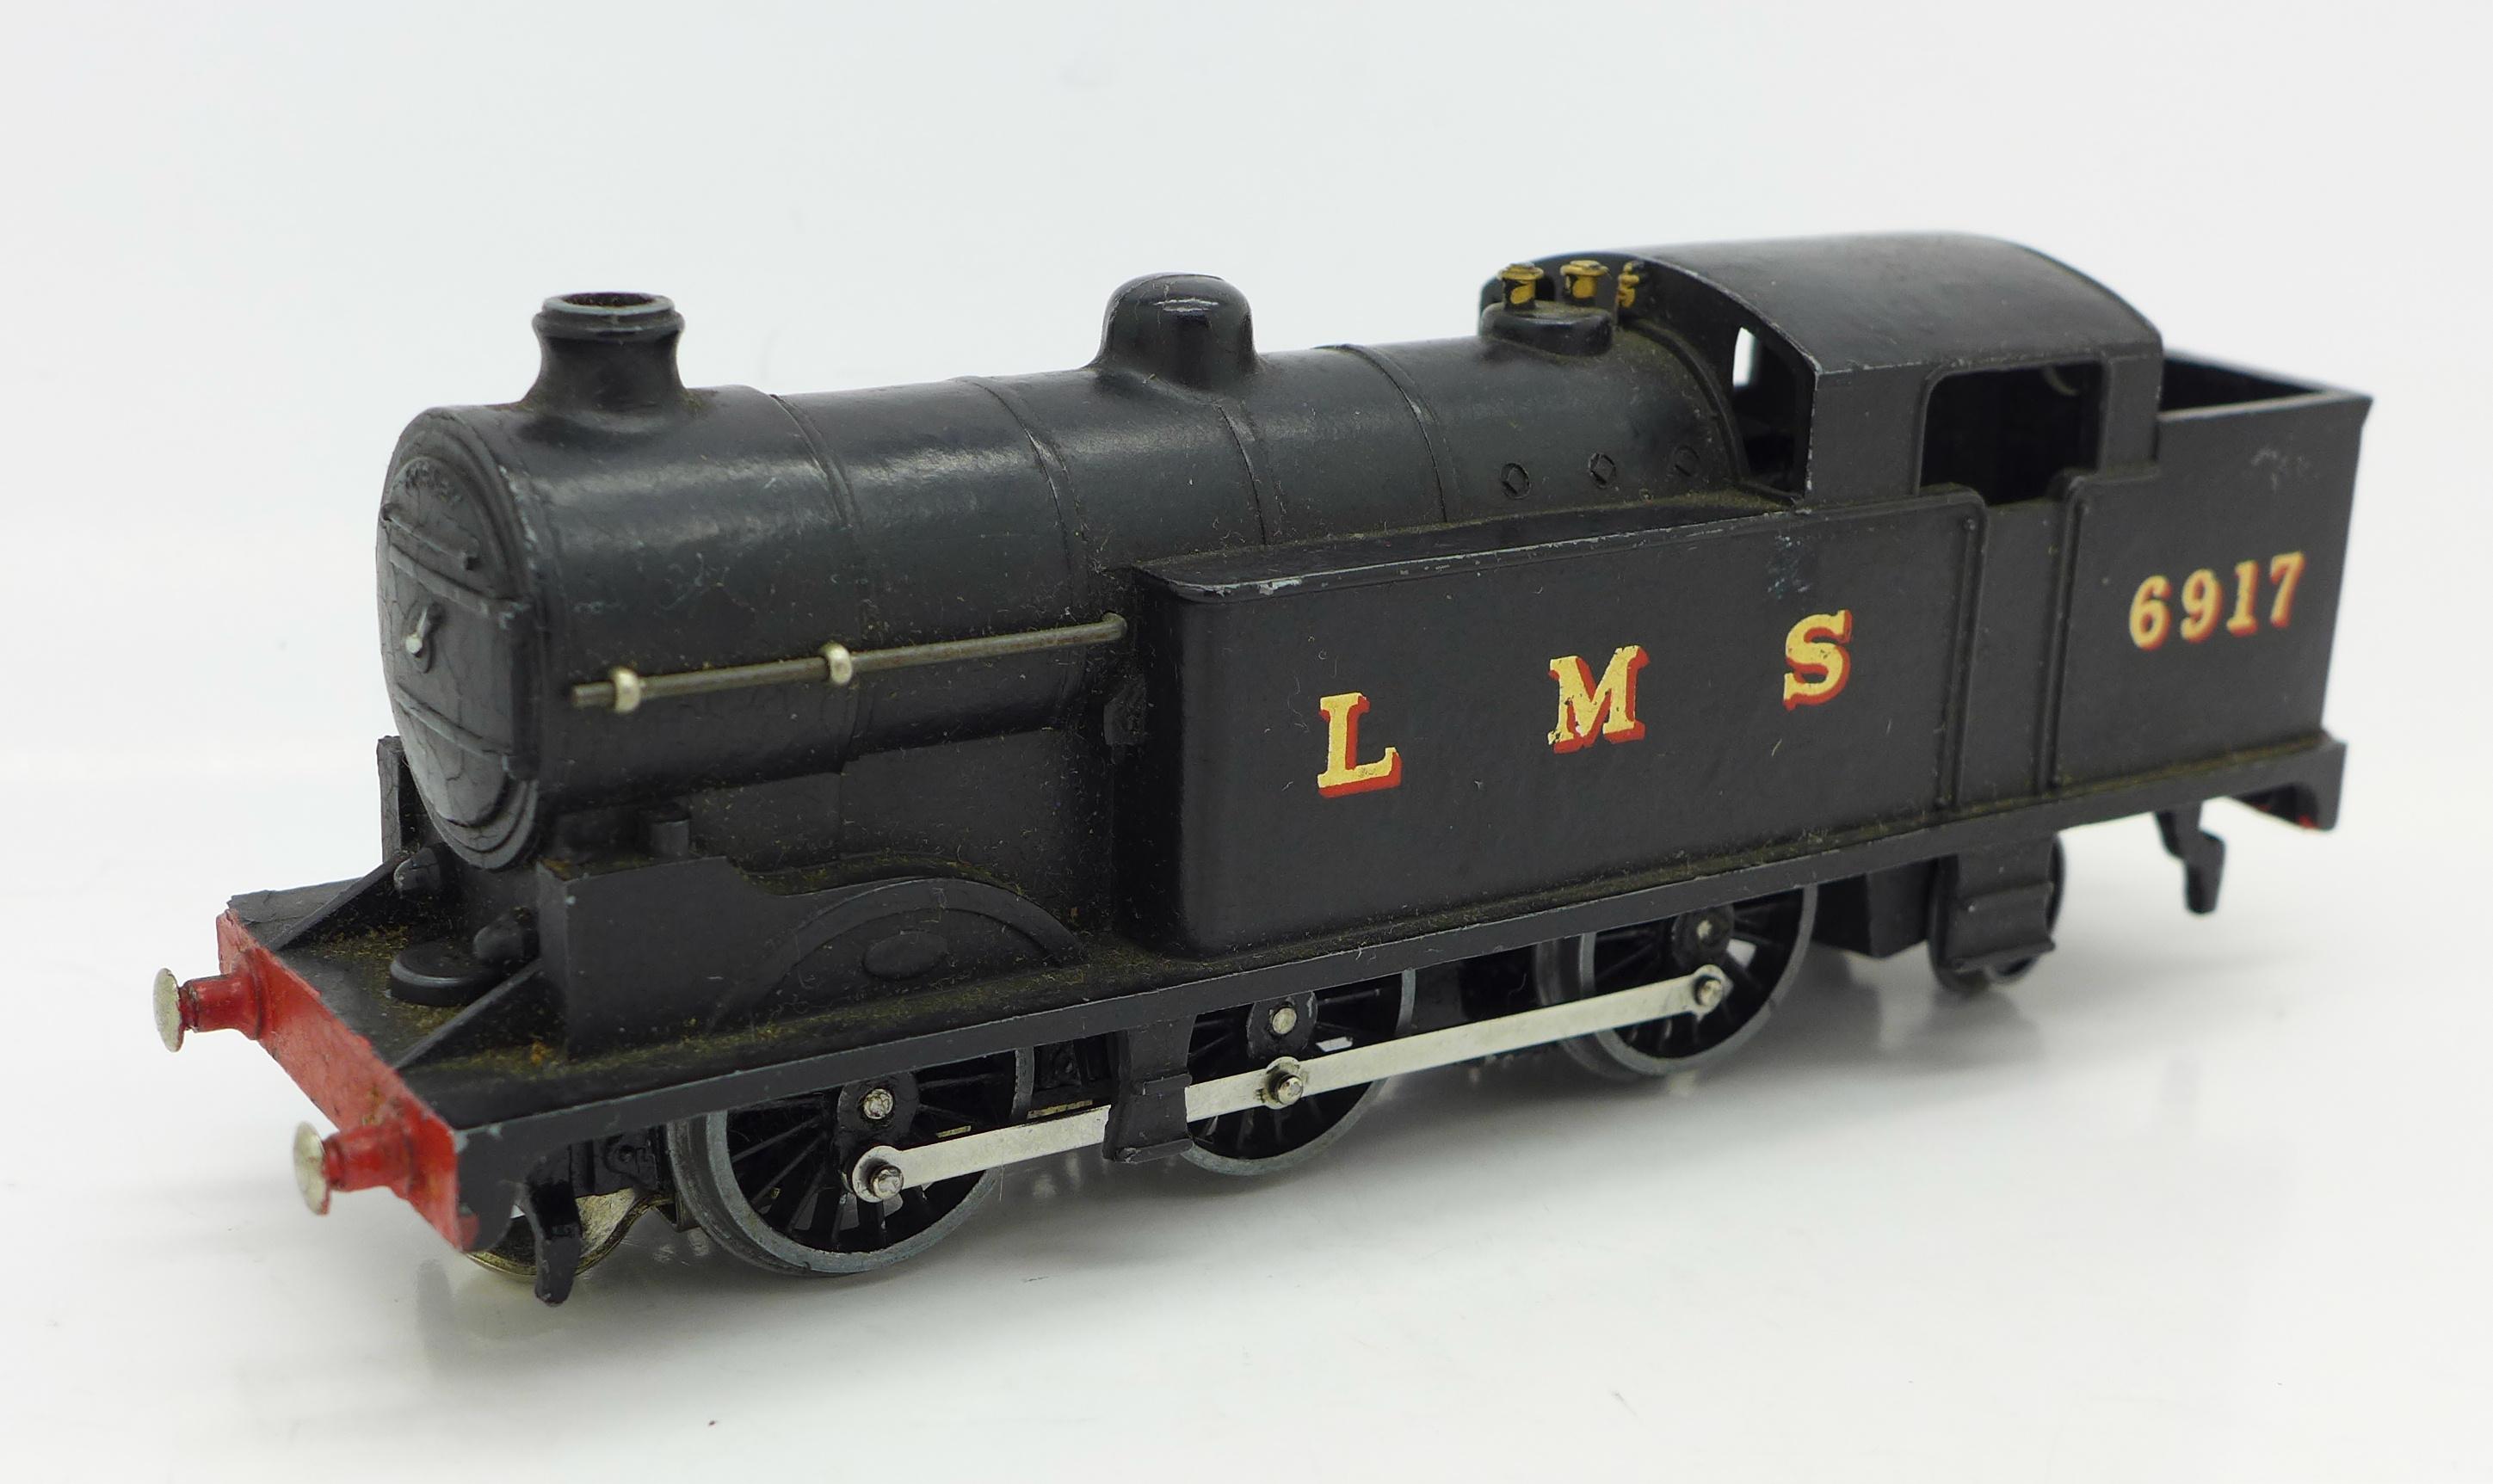 Lot 623 - A pre-war Hornby Dublo LMS 6917 tank locomotive